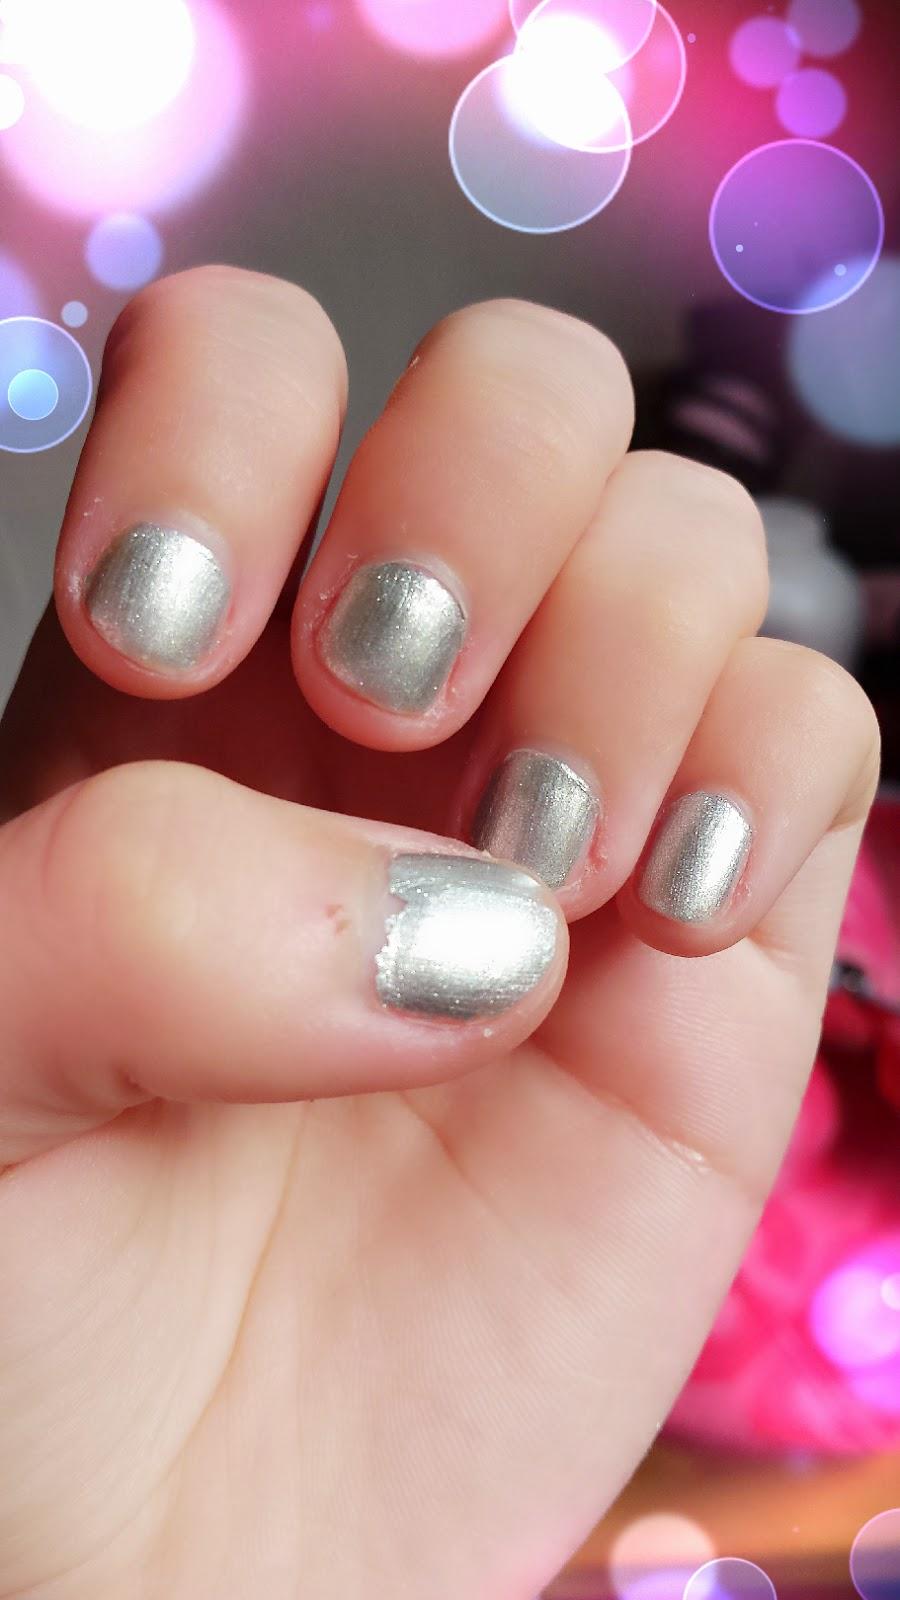 Make-up, Fashion & All Things Kawaii ♥: Avon Gel Finish Nail Enamel ...